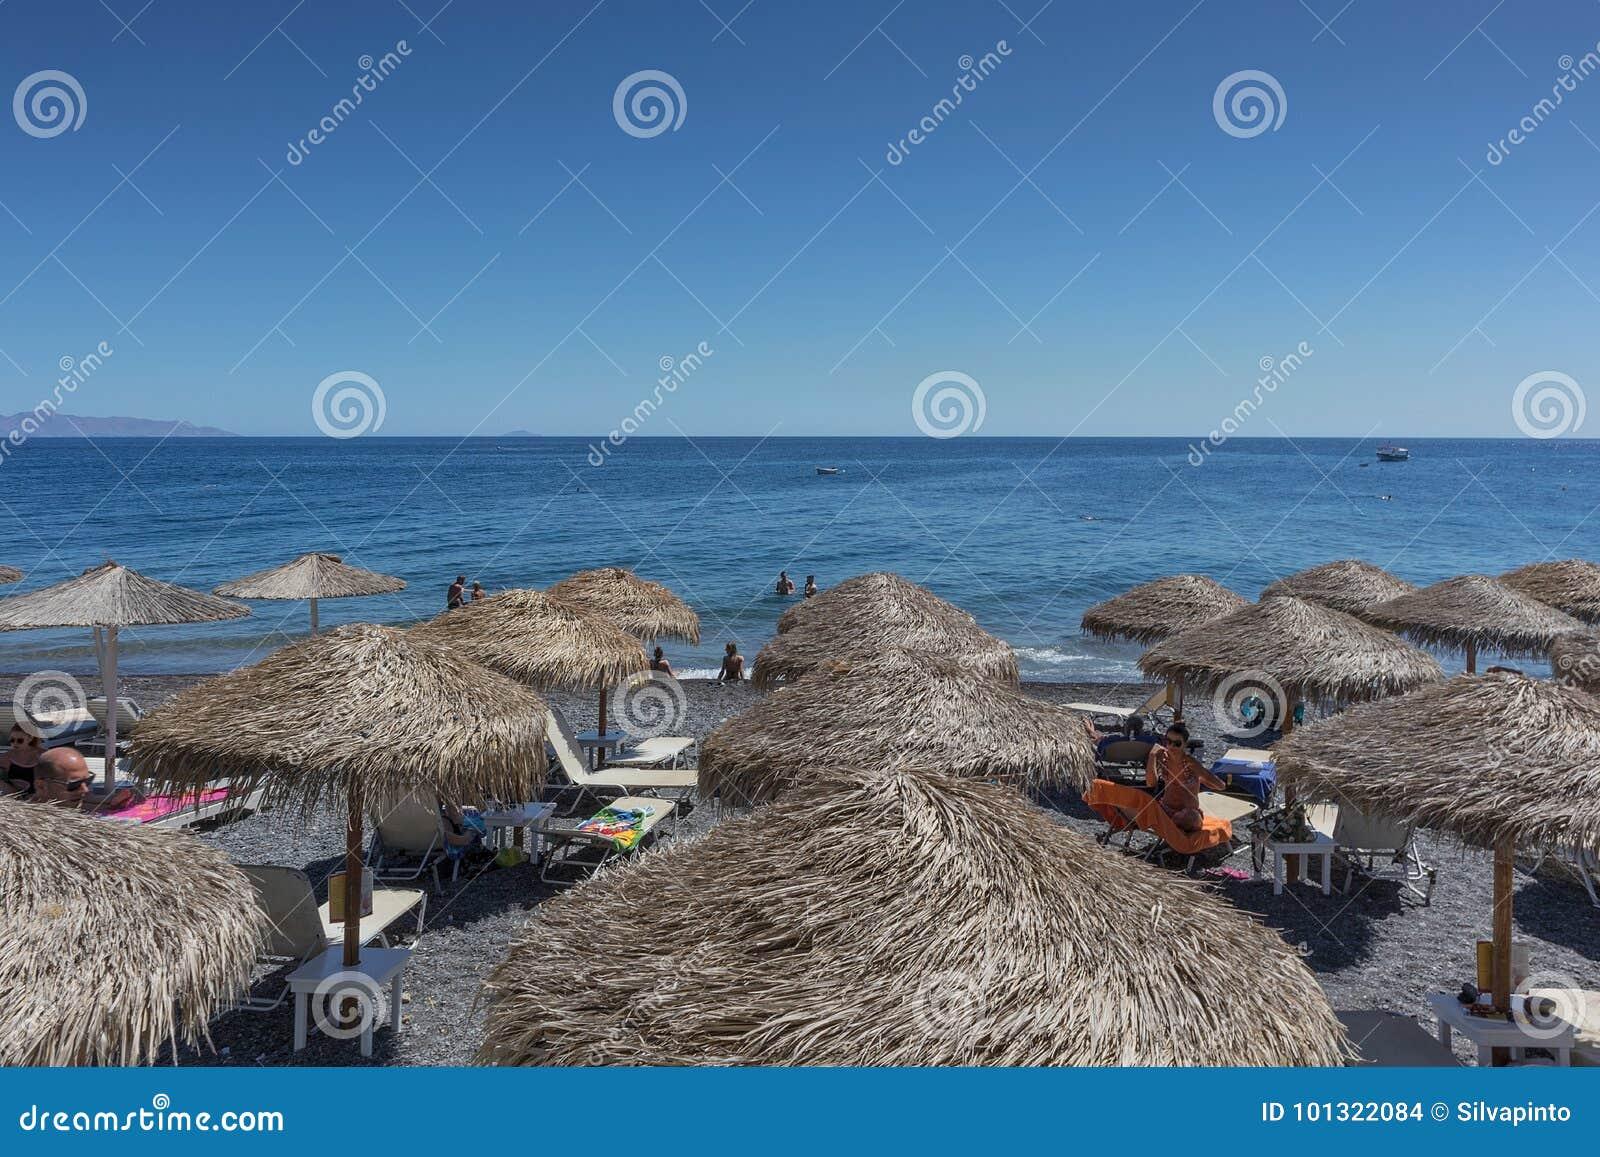 SANTORINI/GREECE 05 SEP, Kamari plaża w Santorini -, Grecja sant